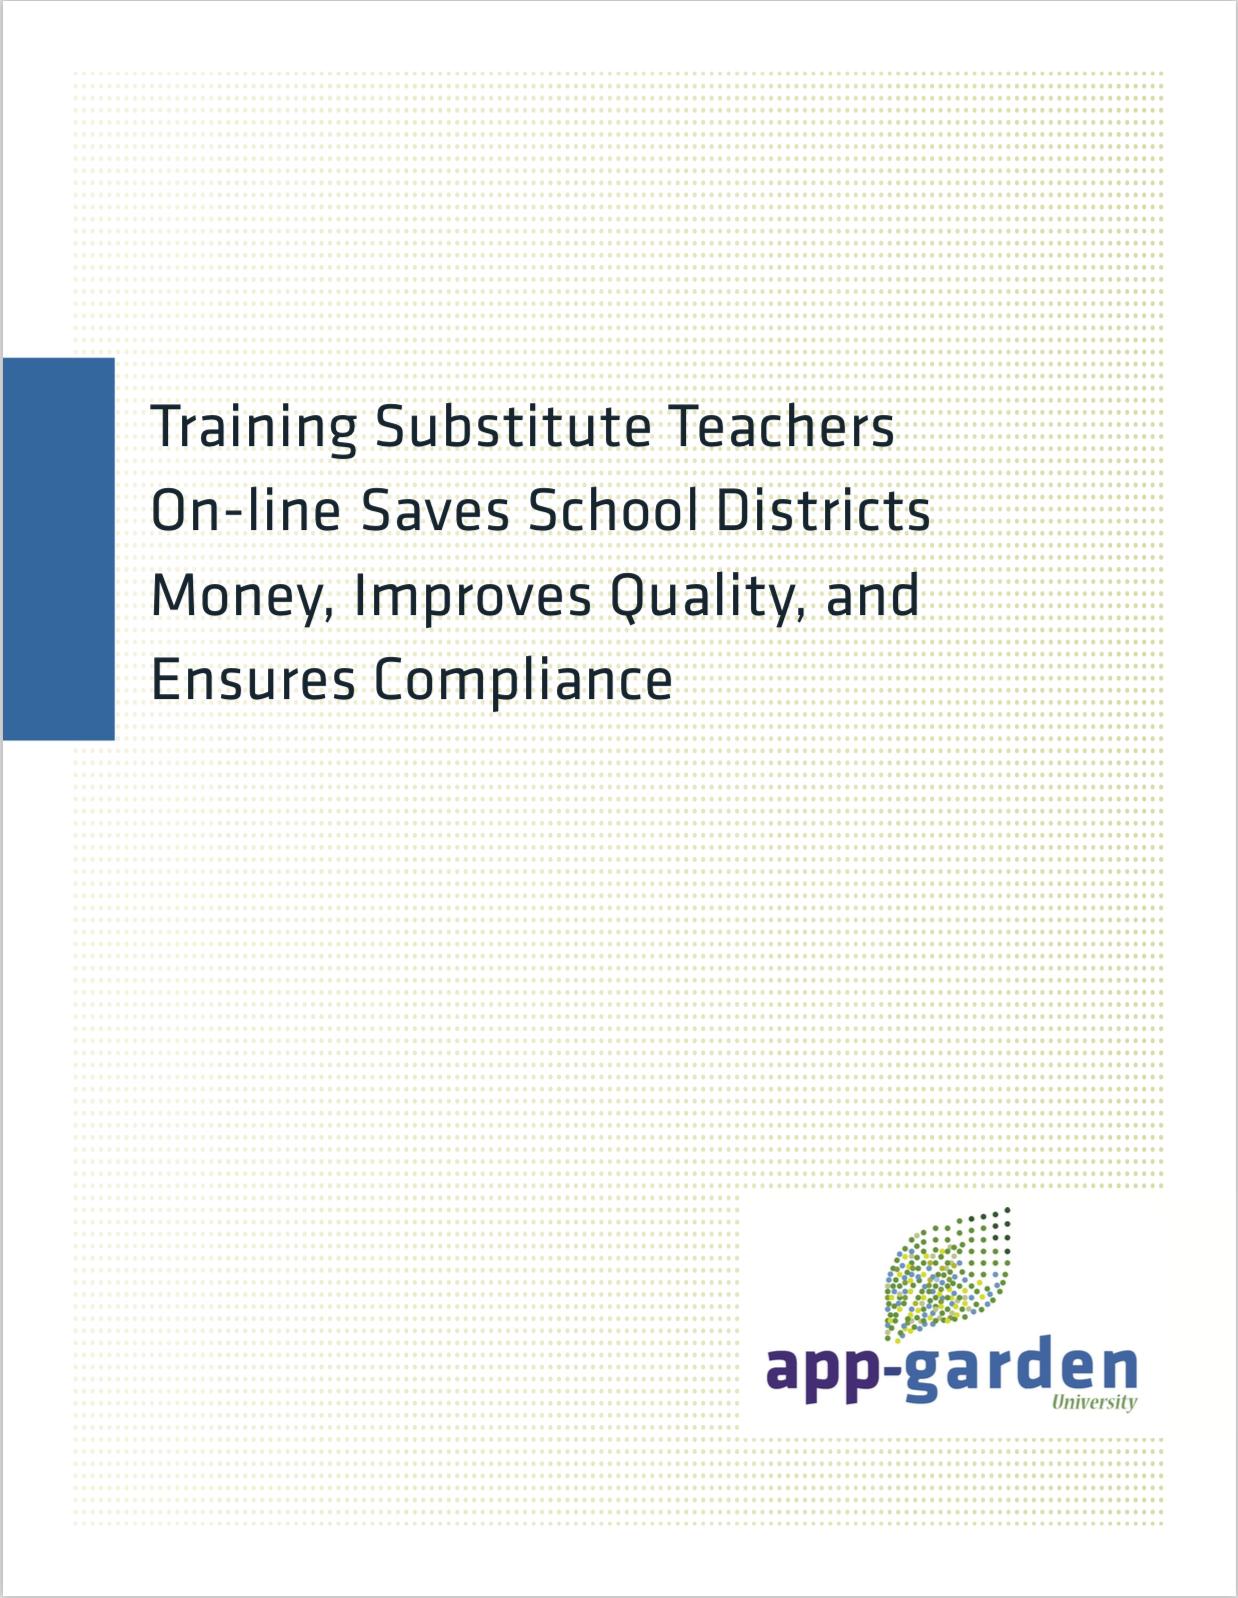 Training Substitute Teachers Online